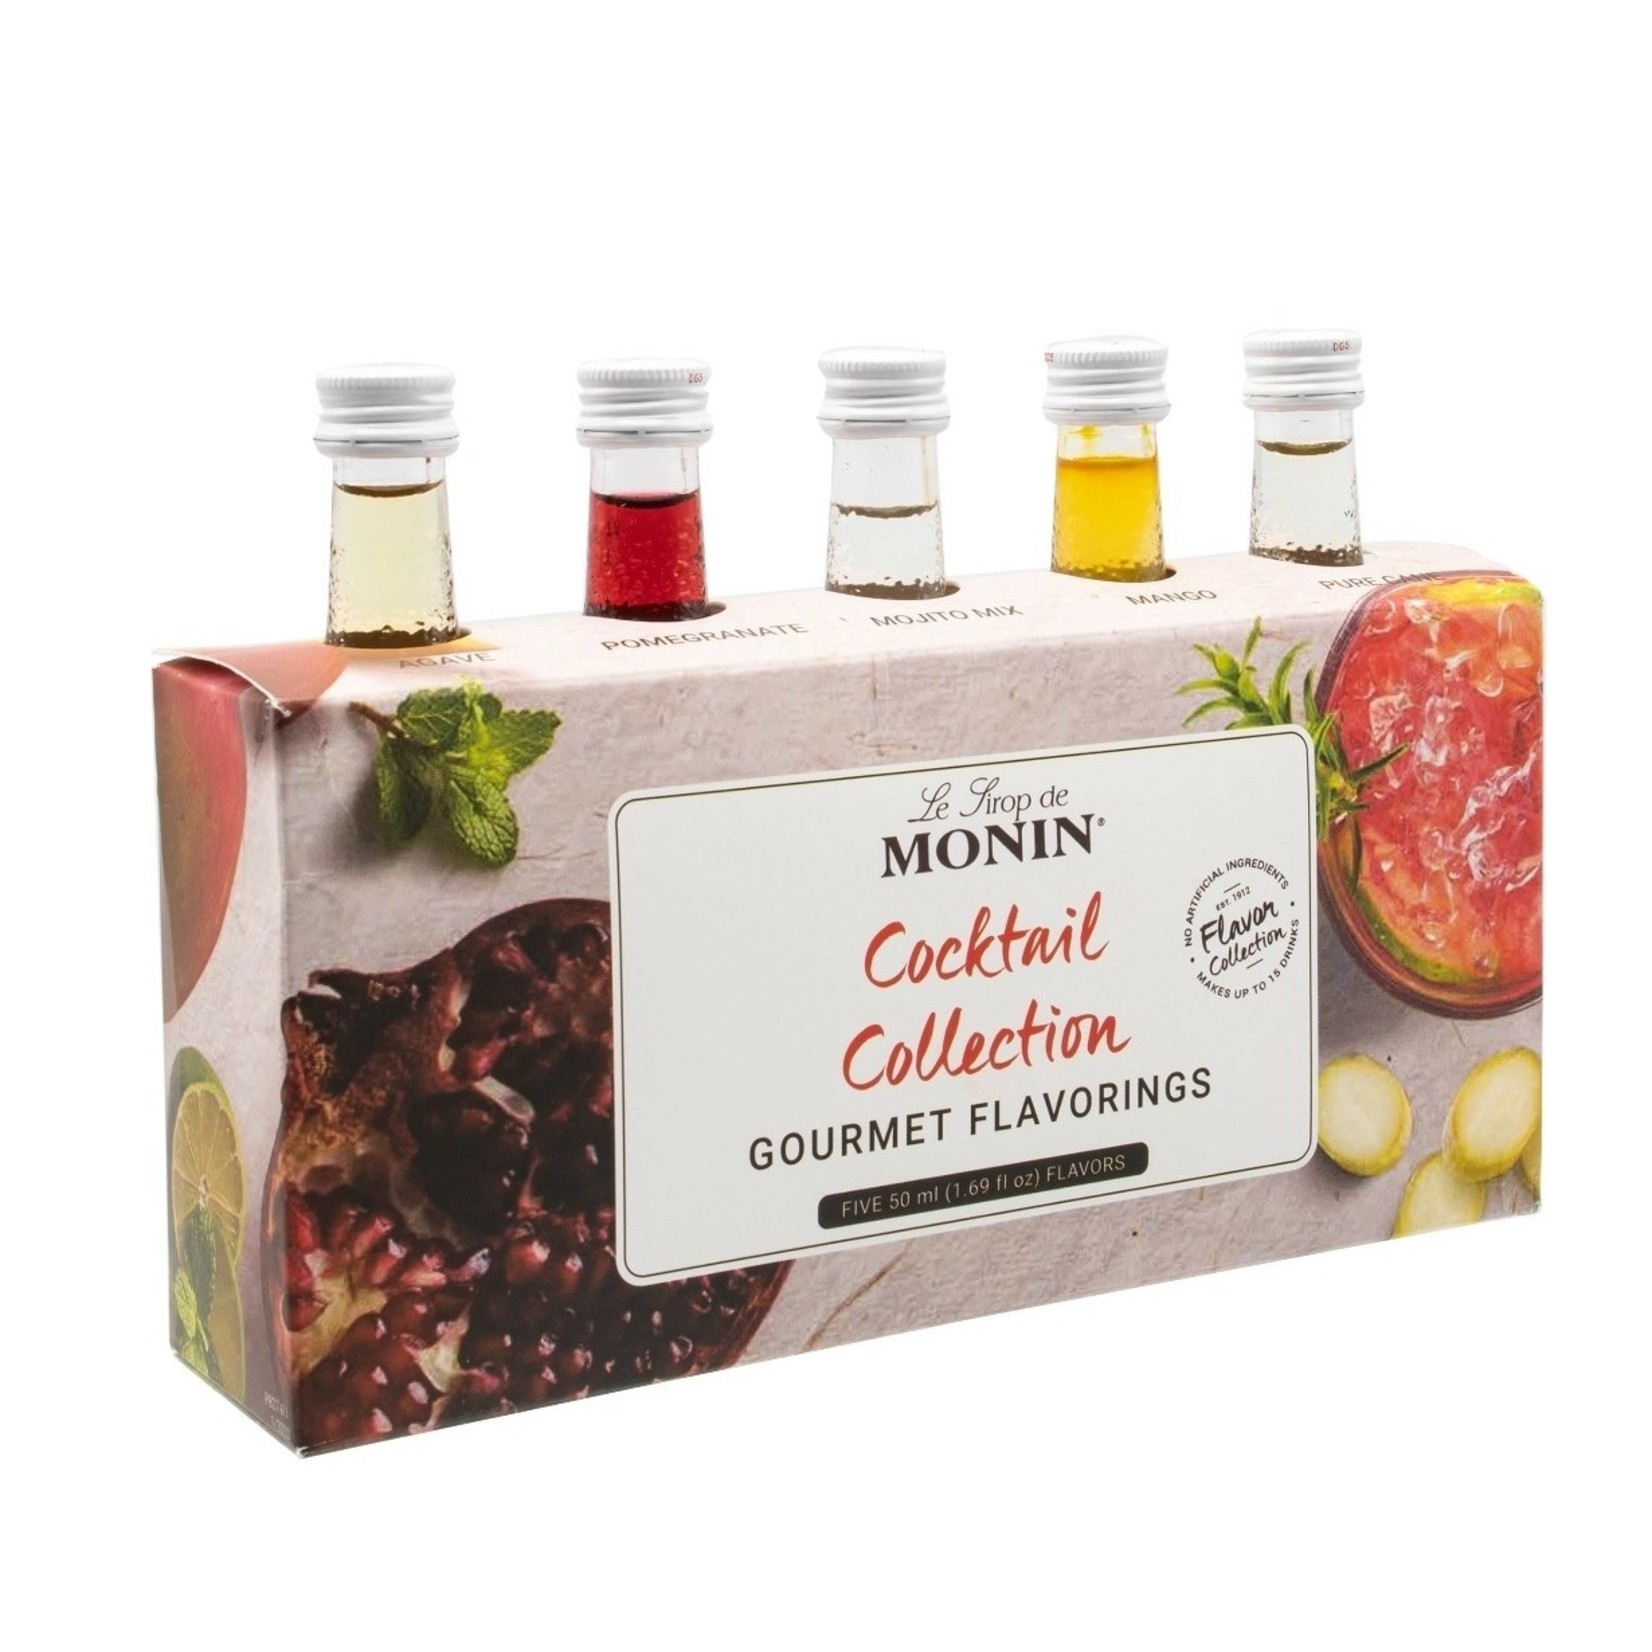 Cocktail Collection Sampler Pack